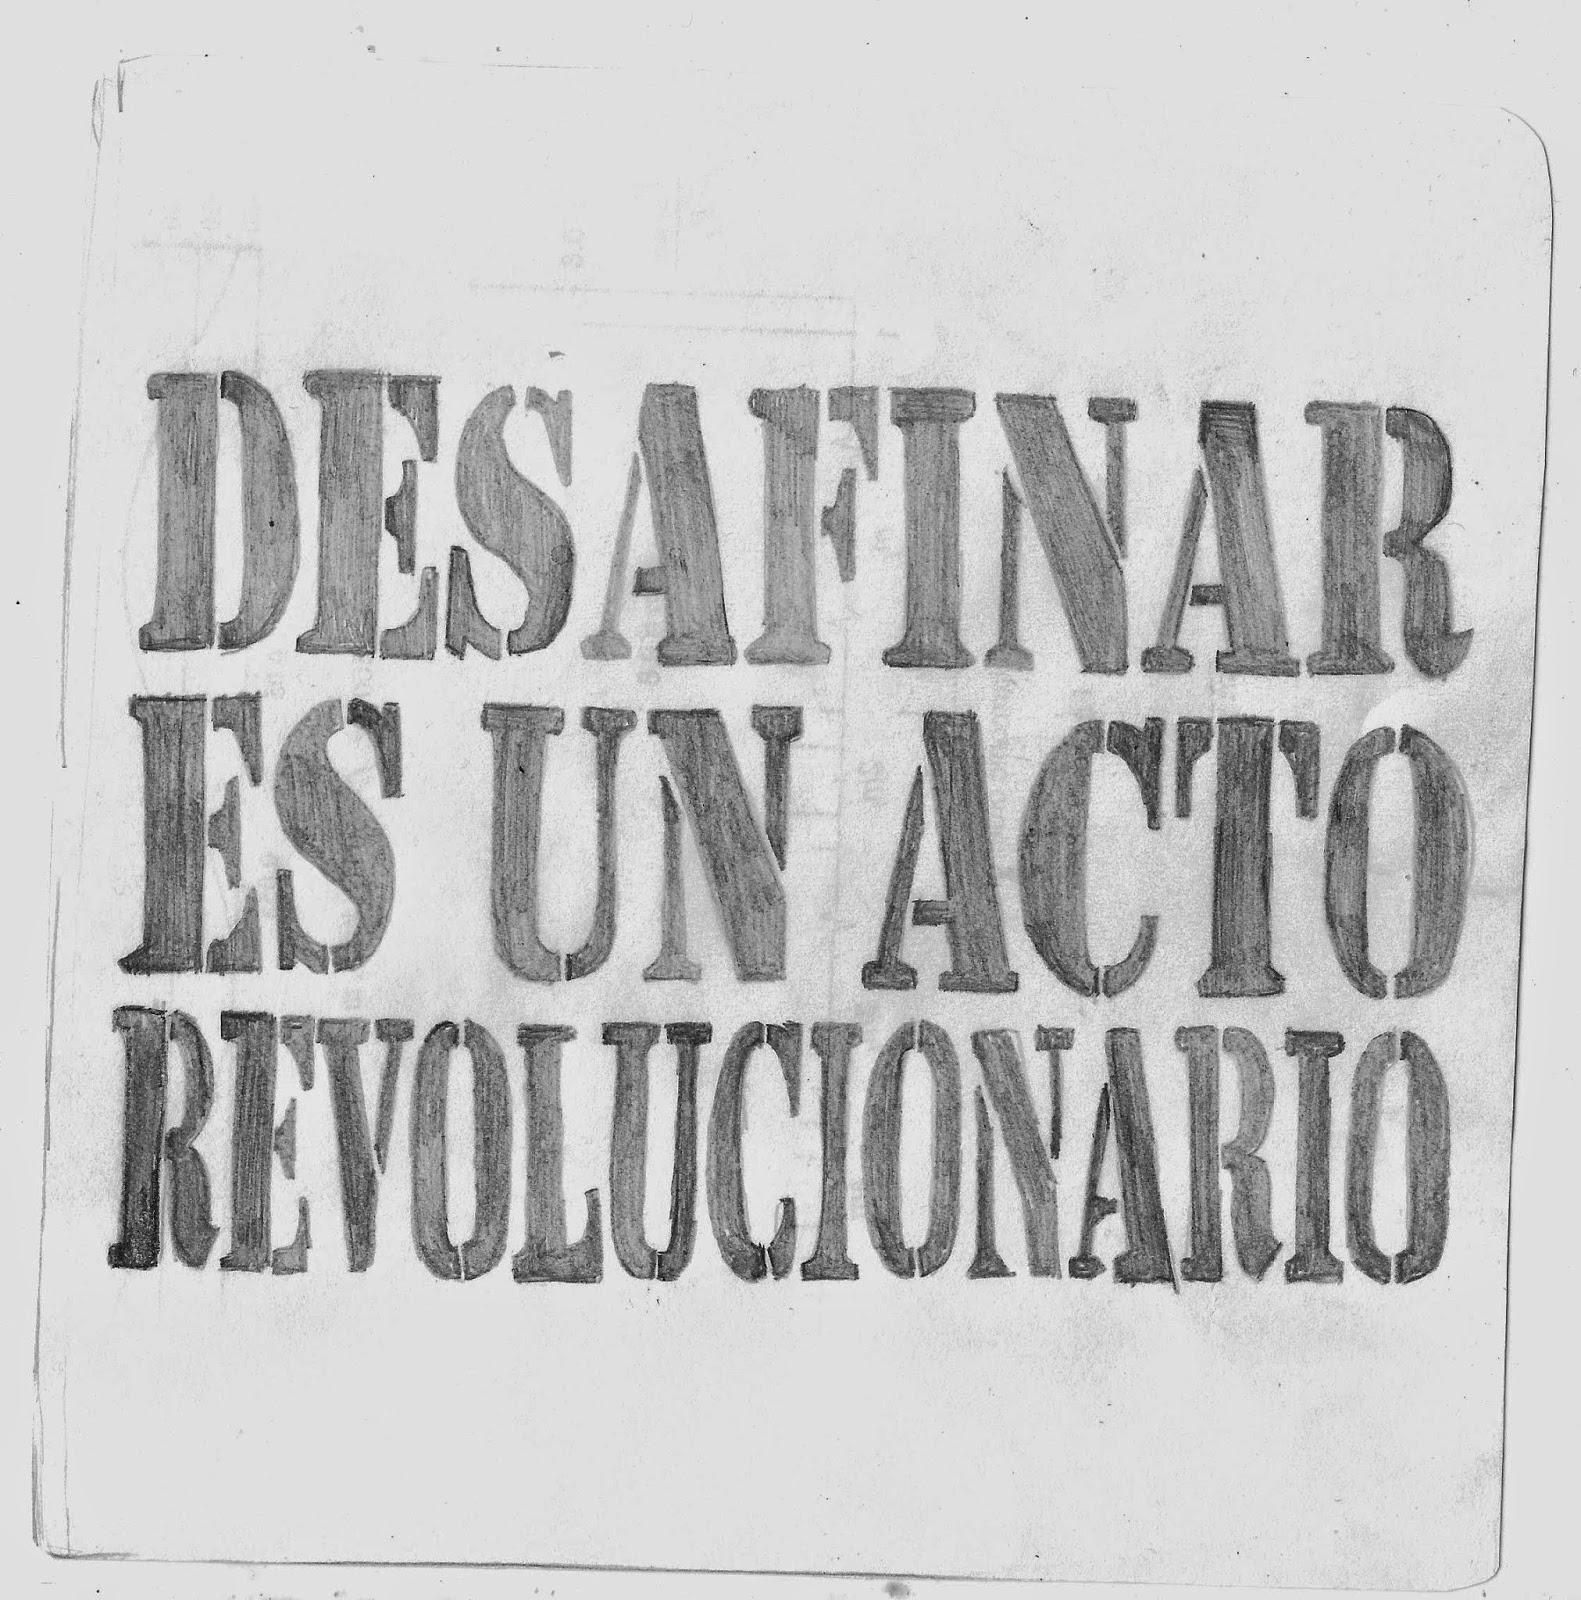 http://sonifiesto.blogspot.com.ar/